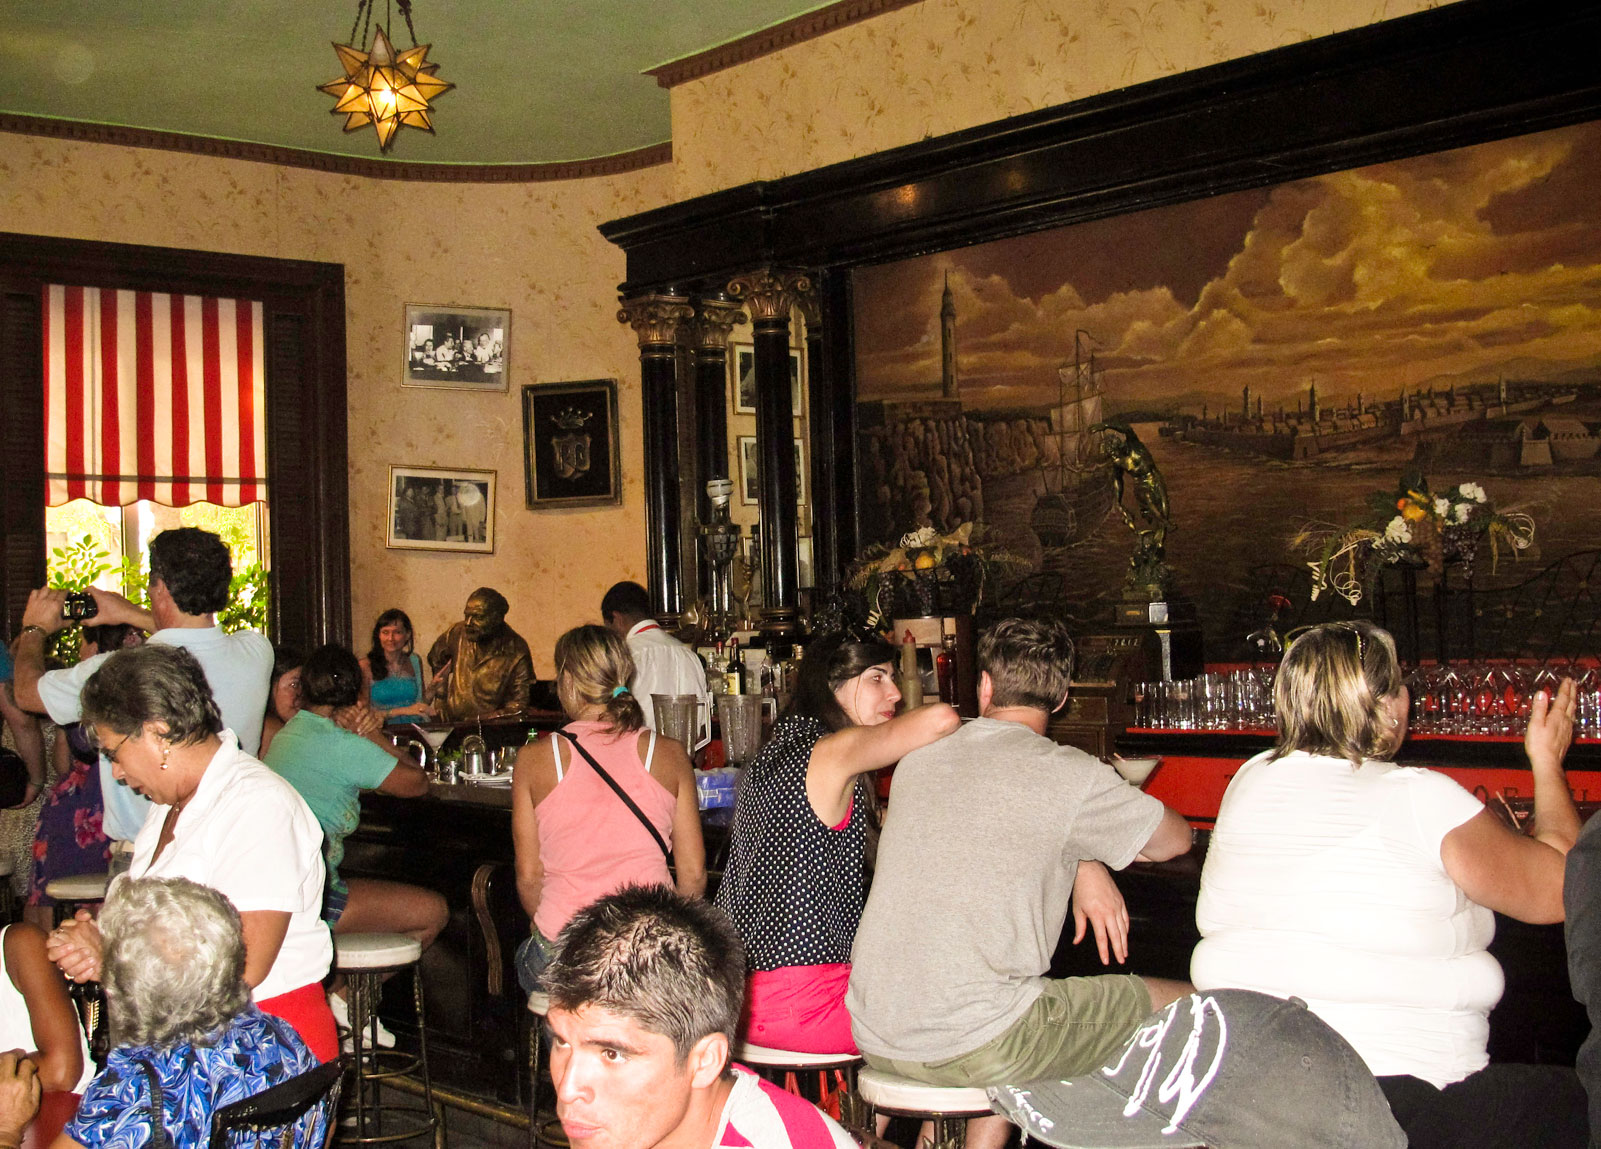 Floridita Havana  Ernest Hemingway Favorite Bar in Havana